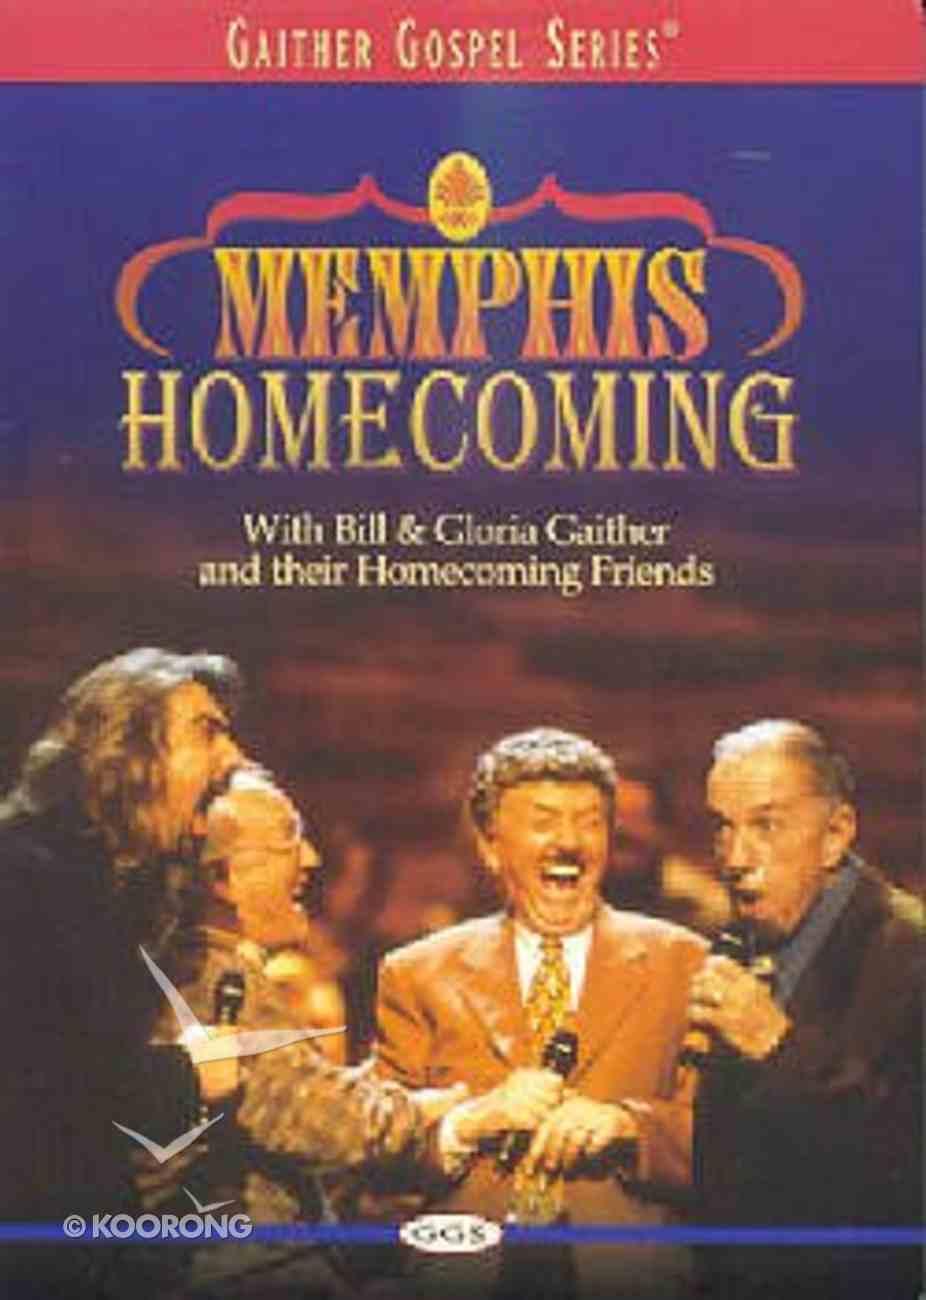 Memphis Homecoming (Gaither Gospel Series) DVD